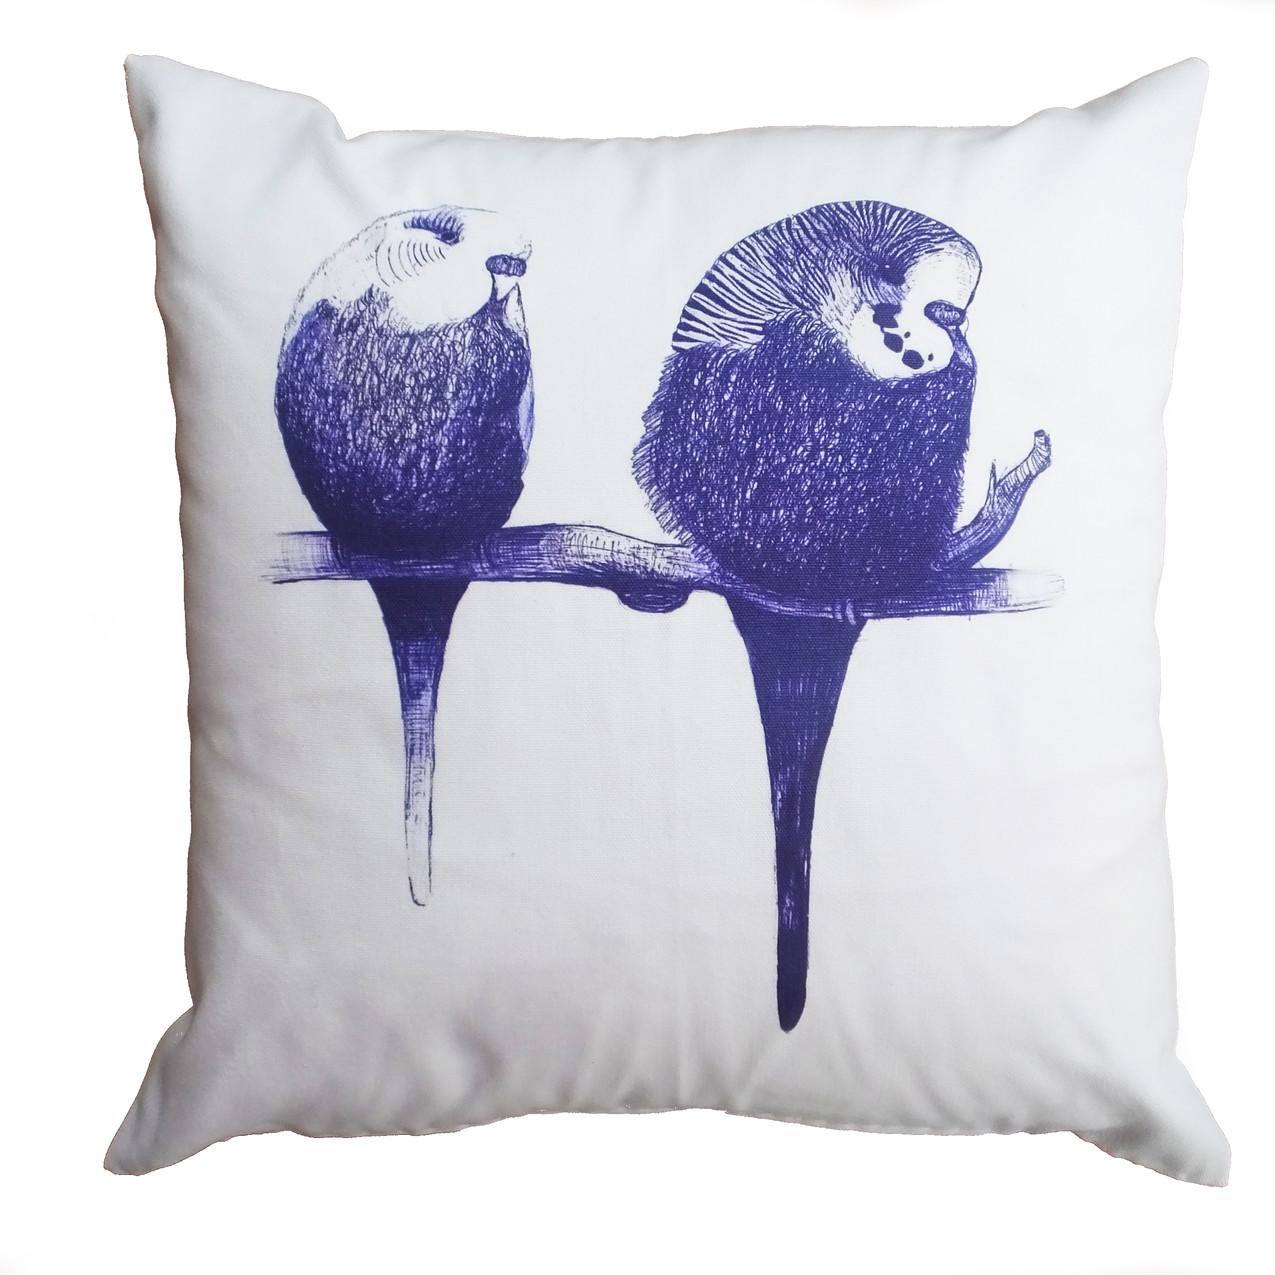 Budgie bird cushion cover on Etsy